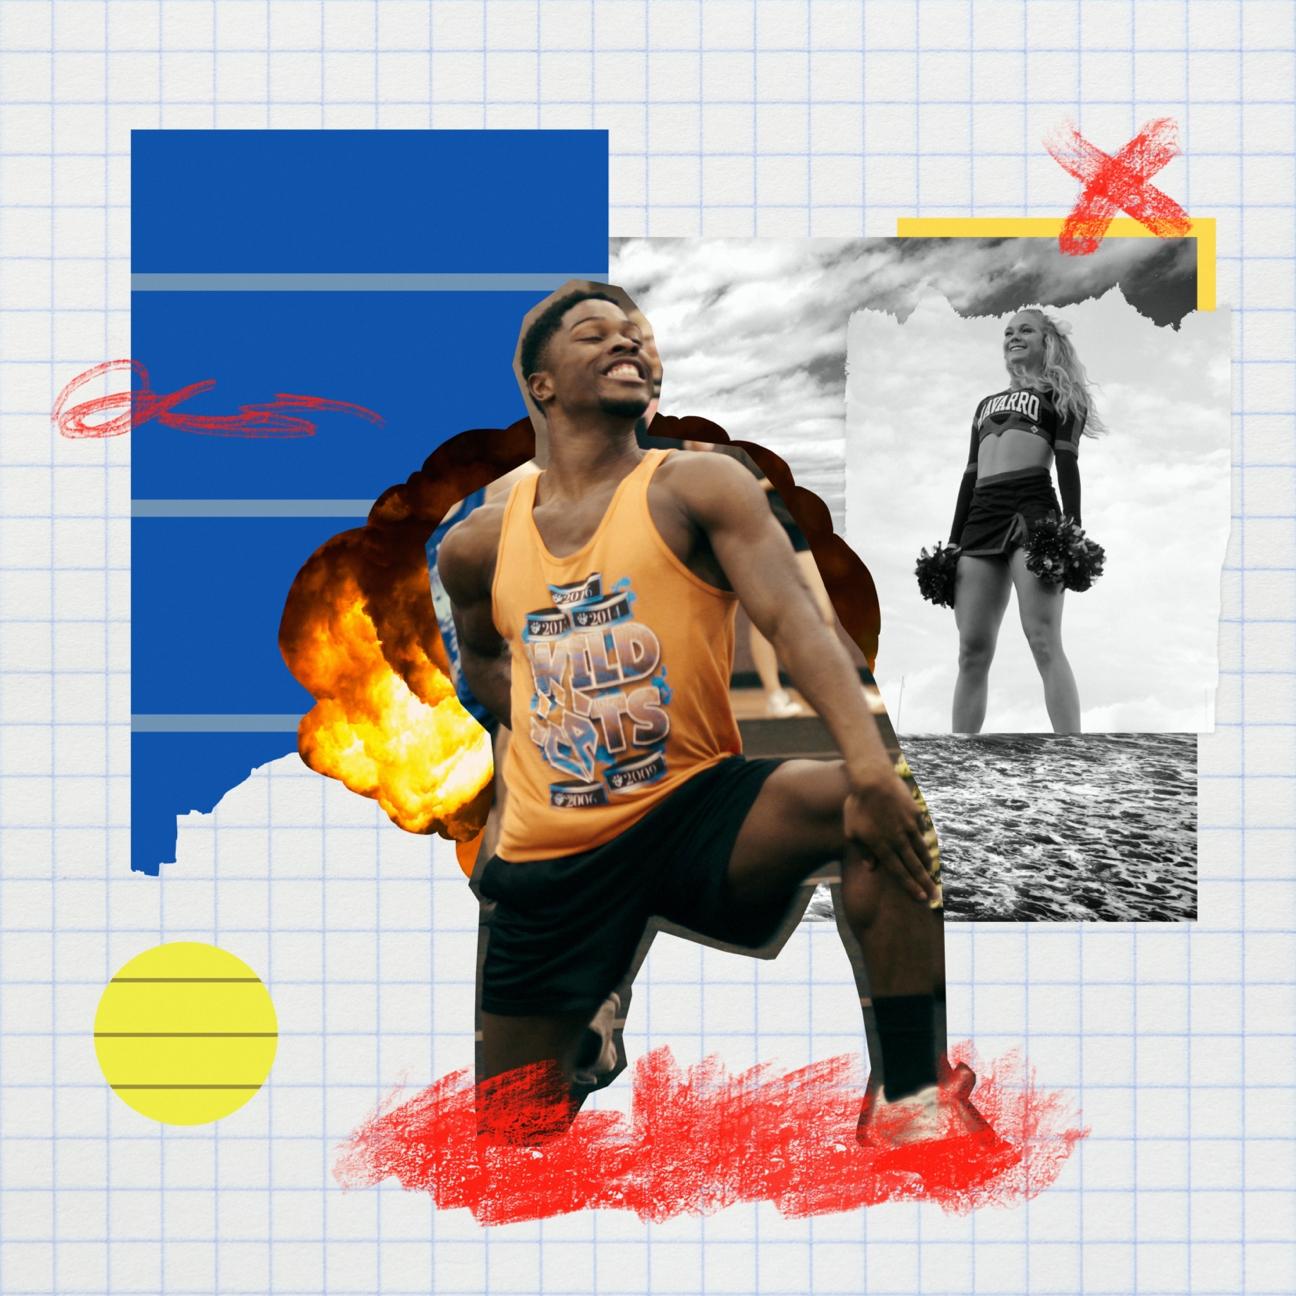 La'Darius Marshall of the Navarro cheerleading program